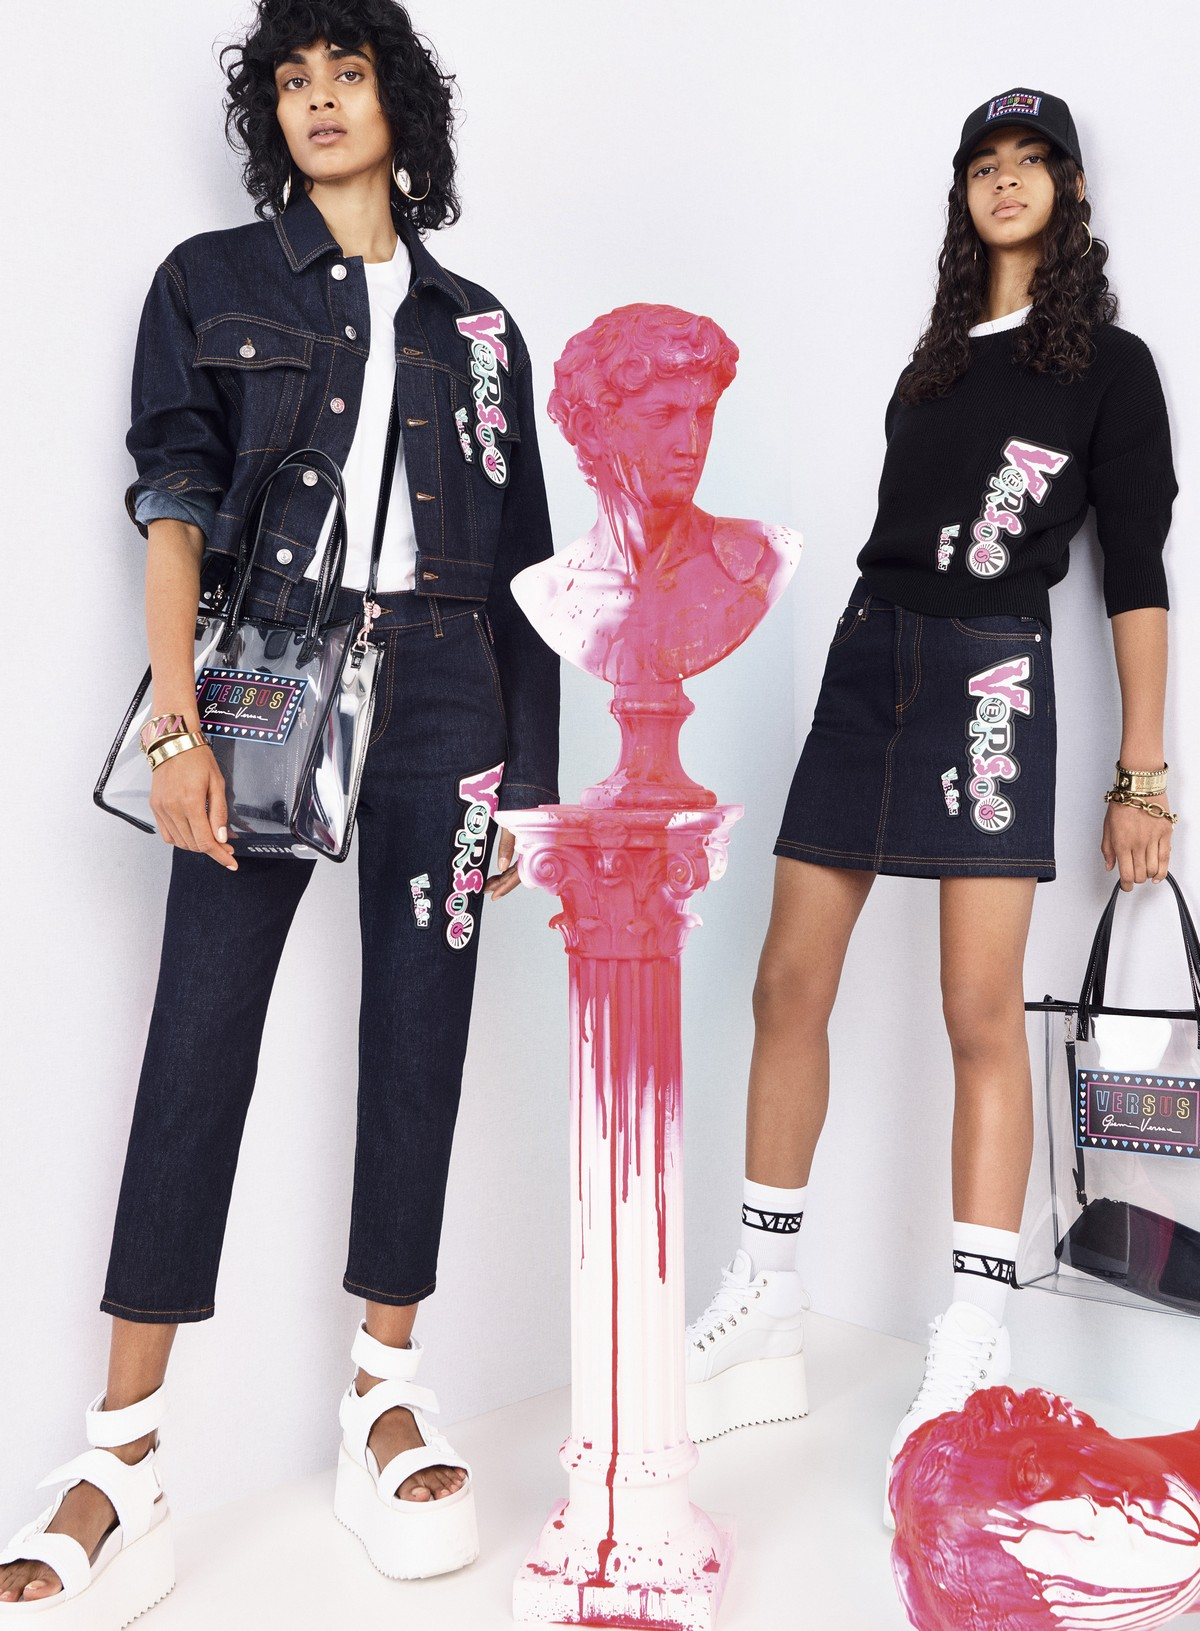 Versus Versace collezione primavera estate 2019